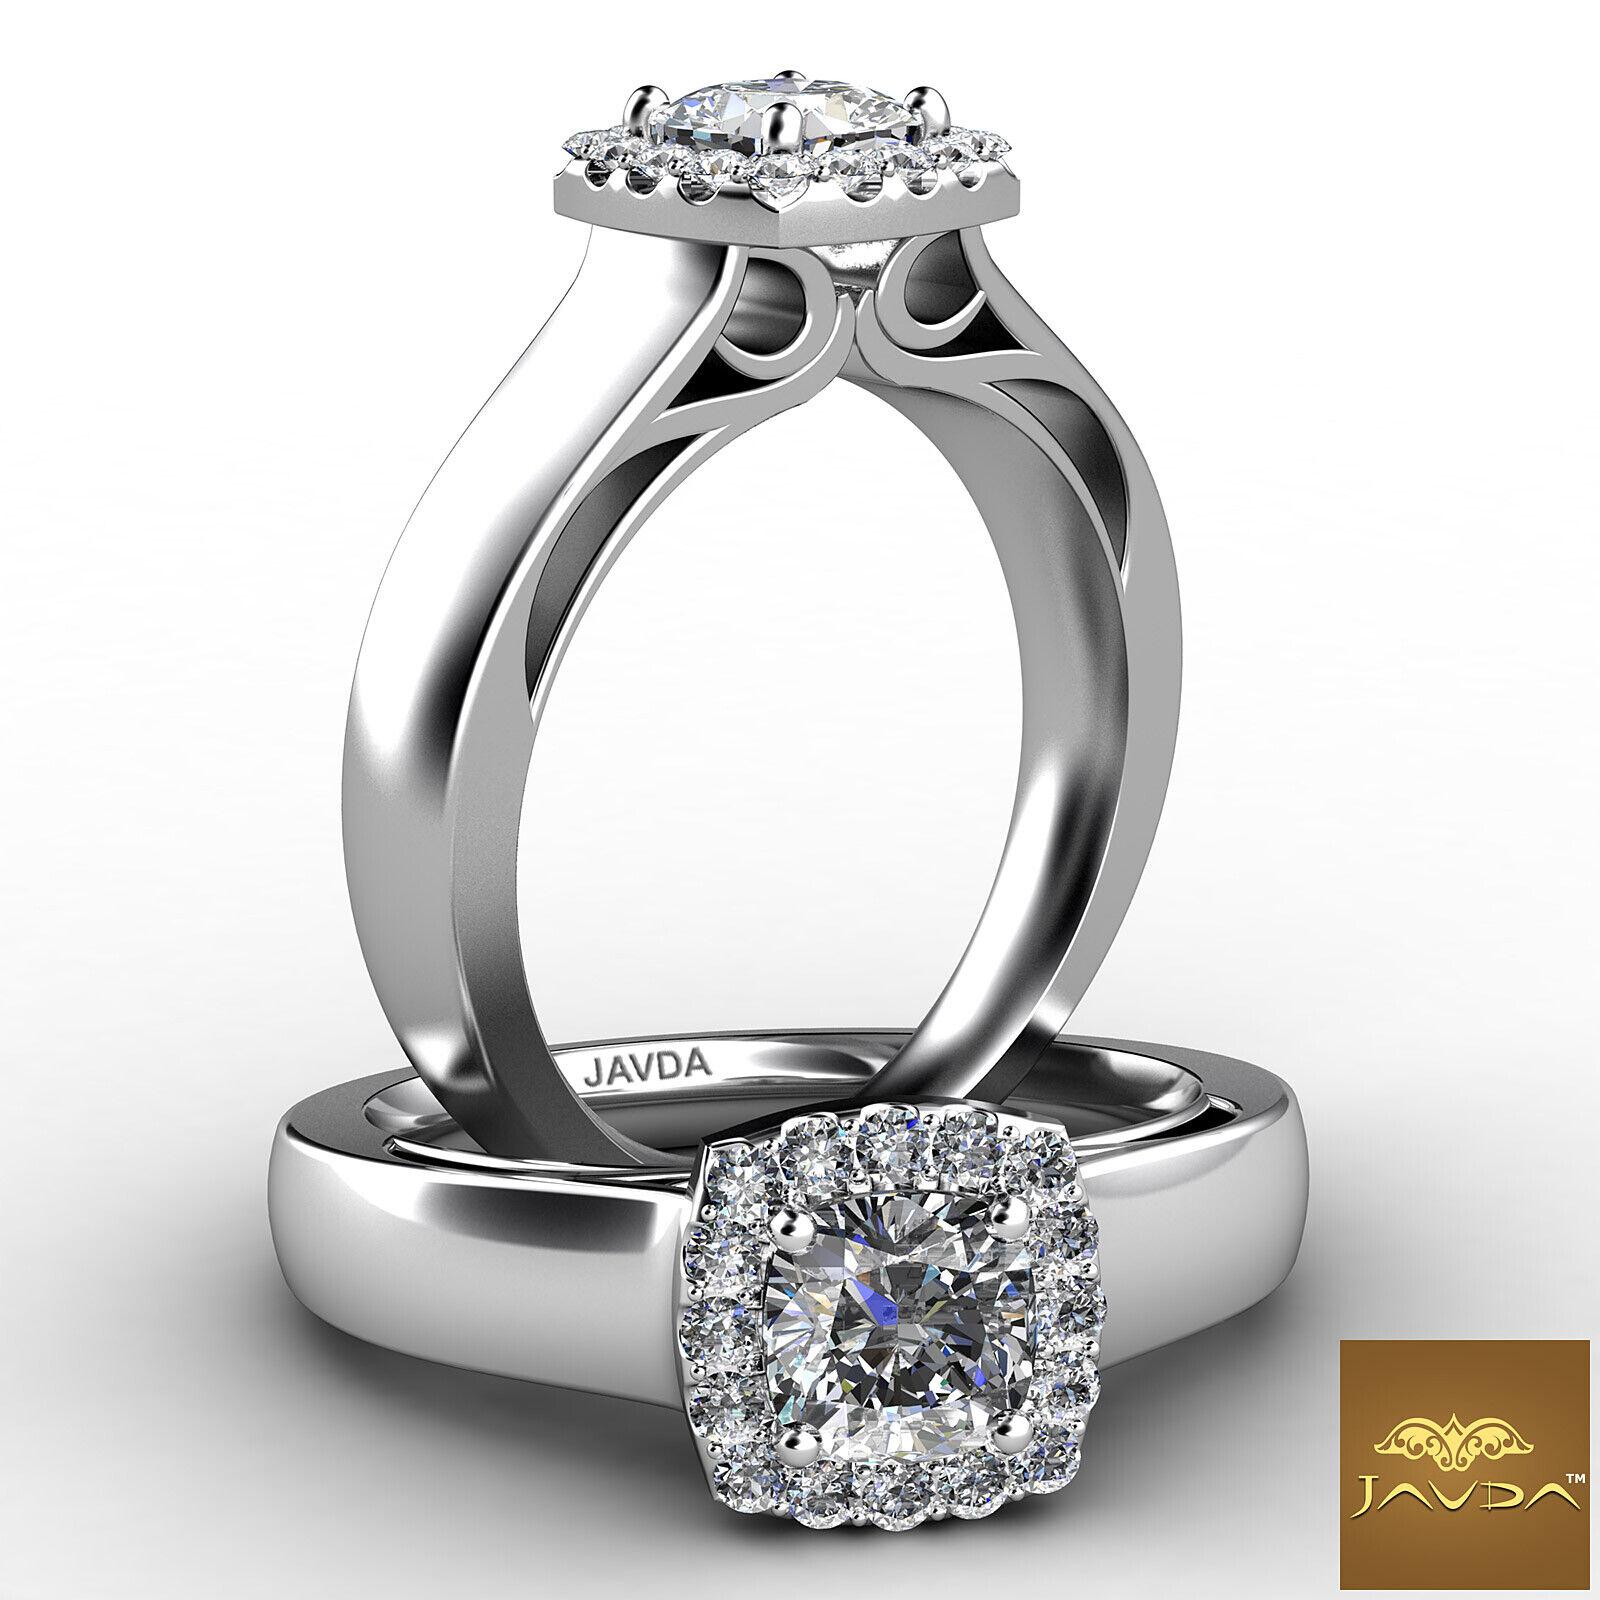 Halo Filigree Shank French Pave Set Cushion Diamond Engagement GIA H VVS2 0.7Ct